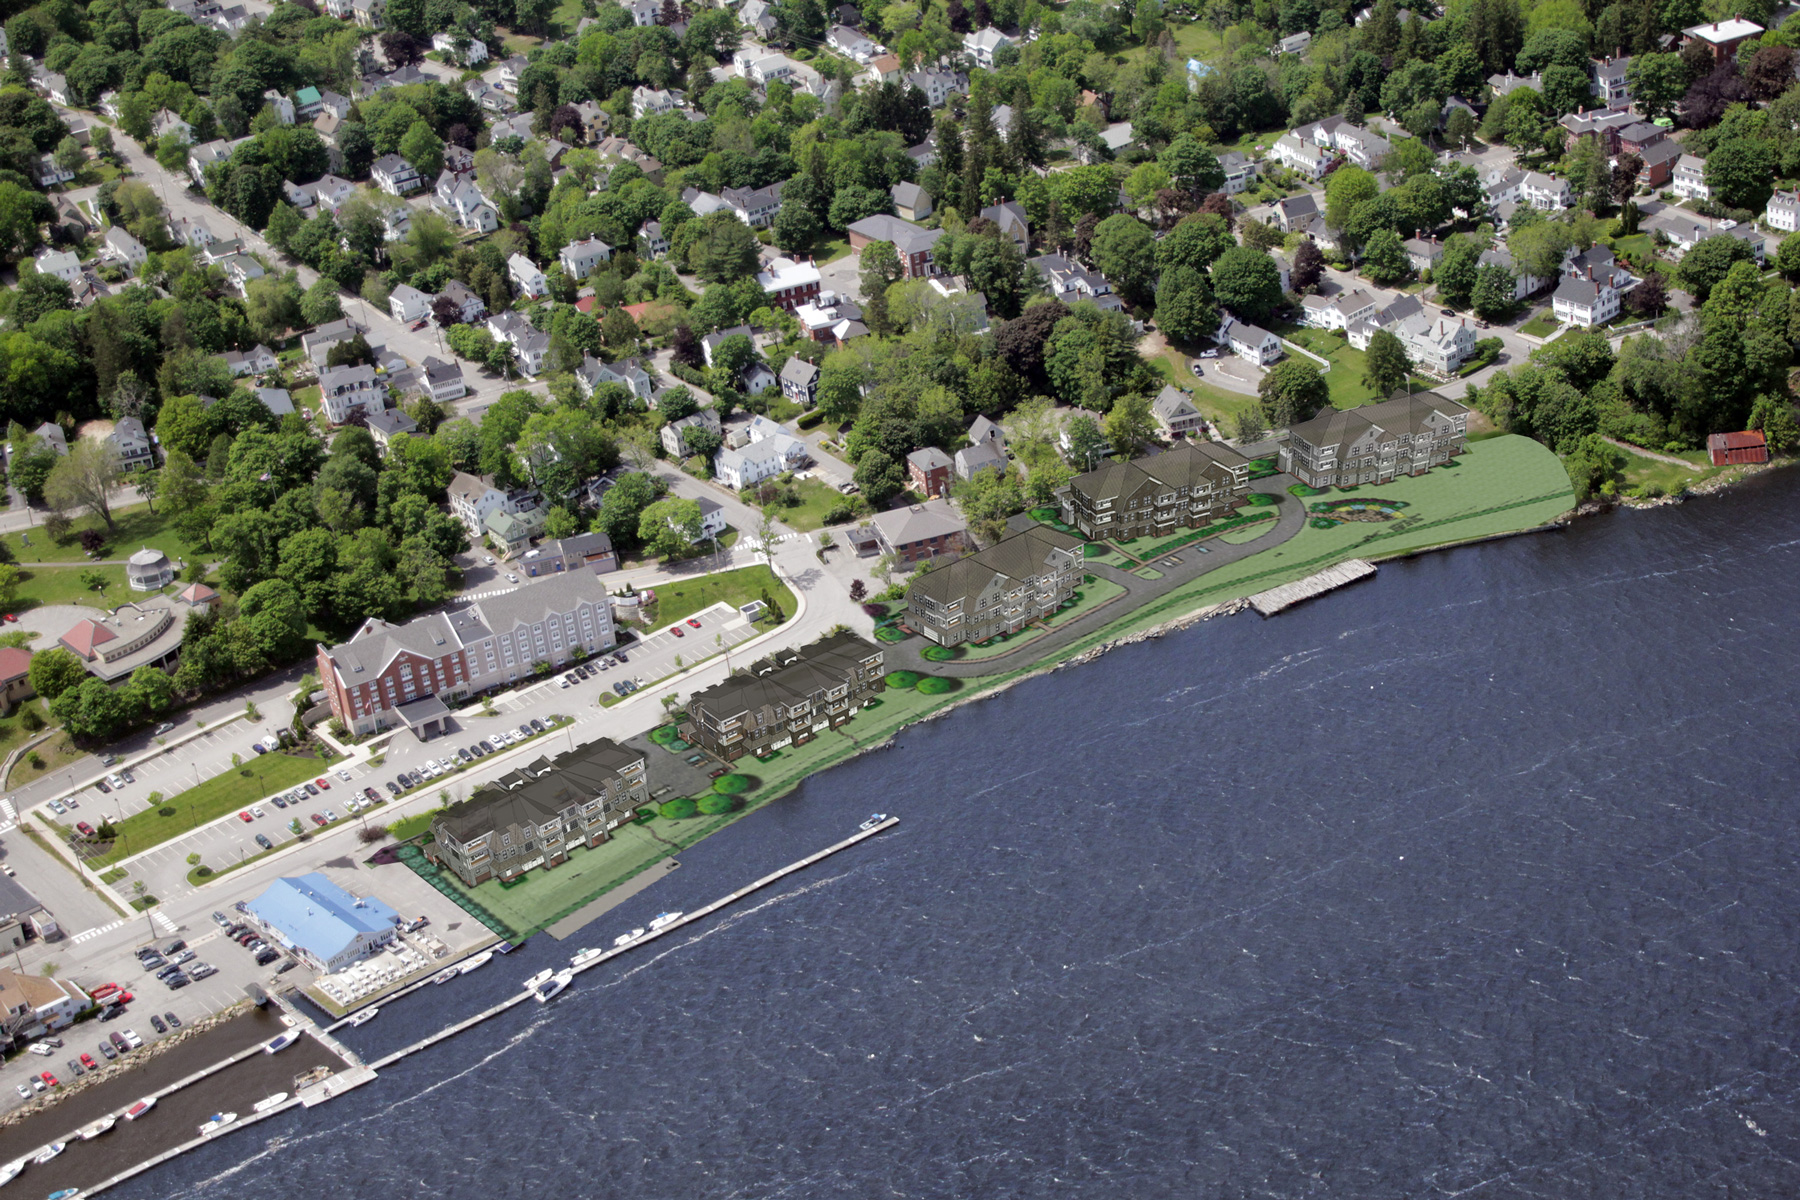 Condominium for Sale at 145 Commercial Street, # 203 Bath, Maine, 04530 United States